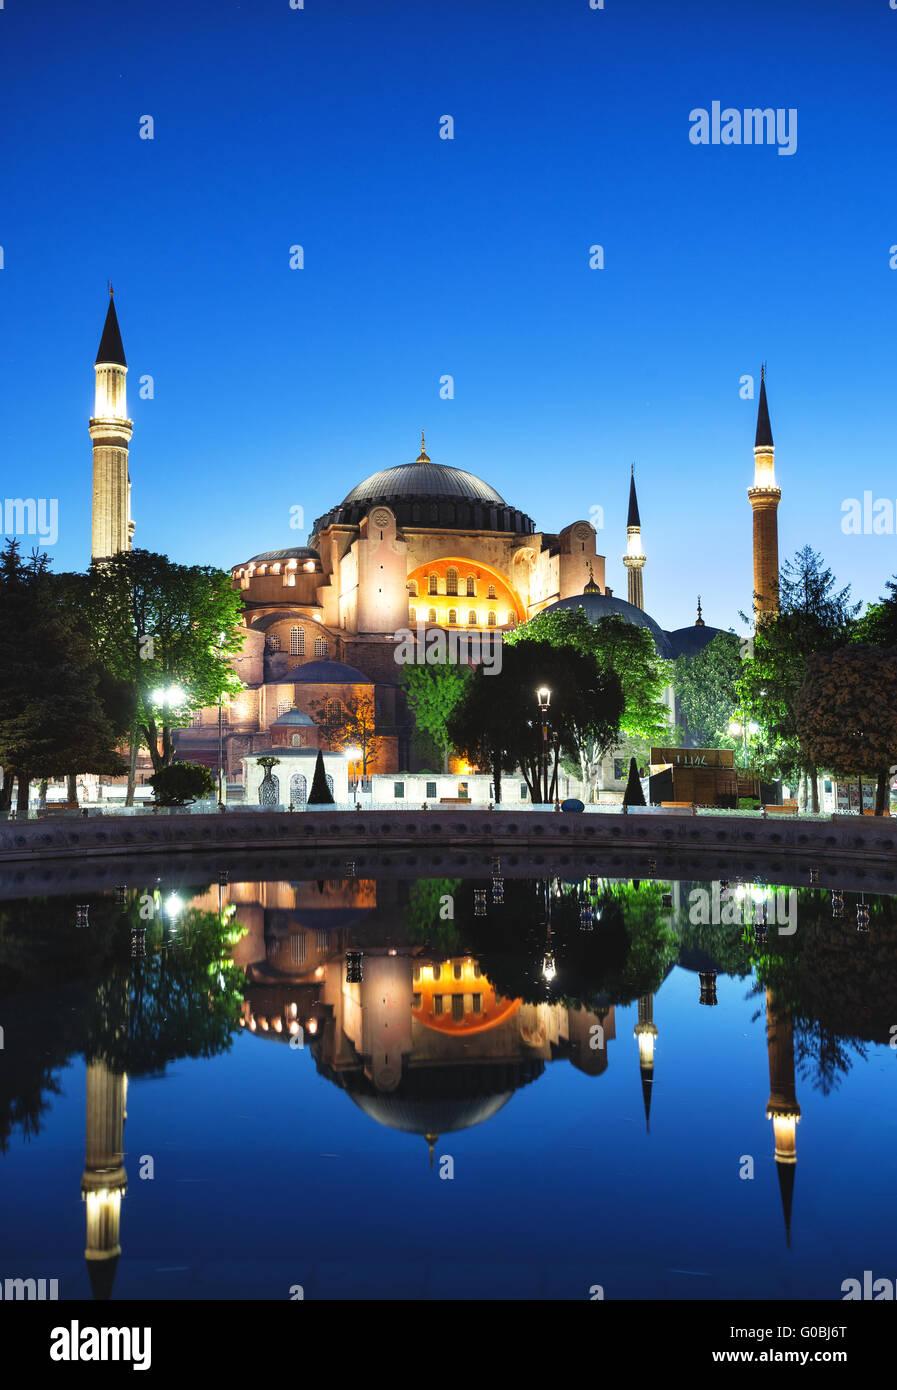 Hagia Sophia moschea in serata. Istanbul, Turchia. Foto Stock